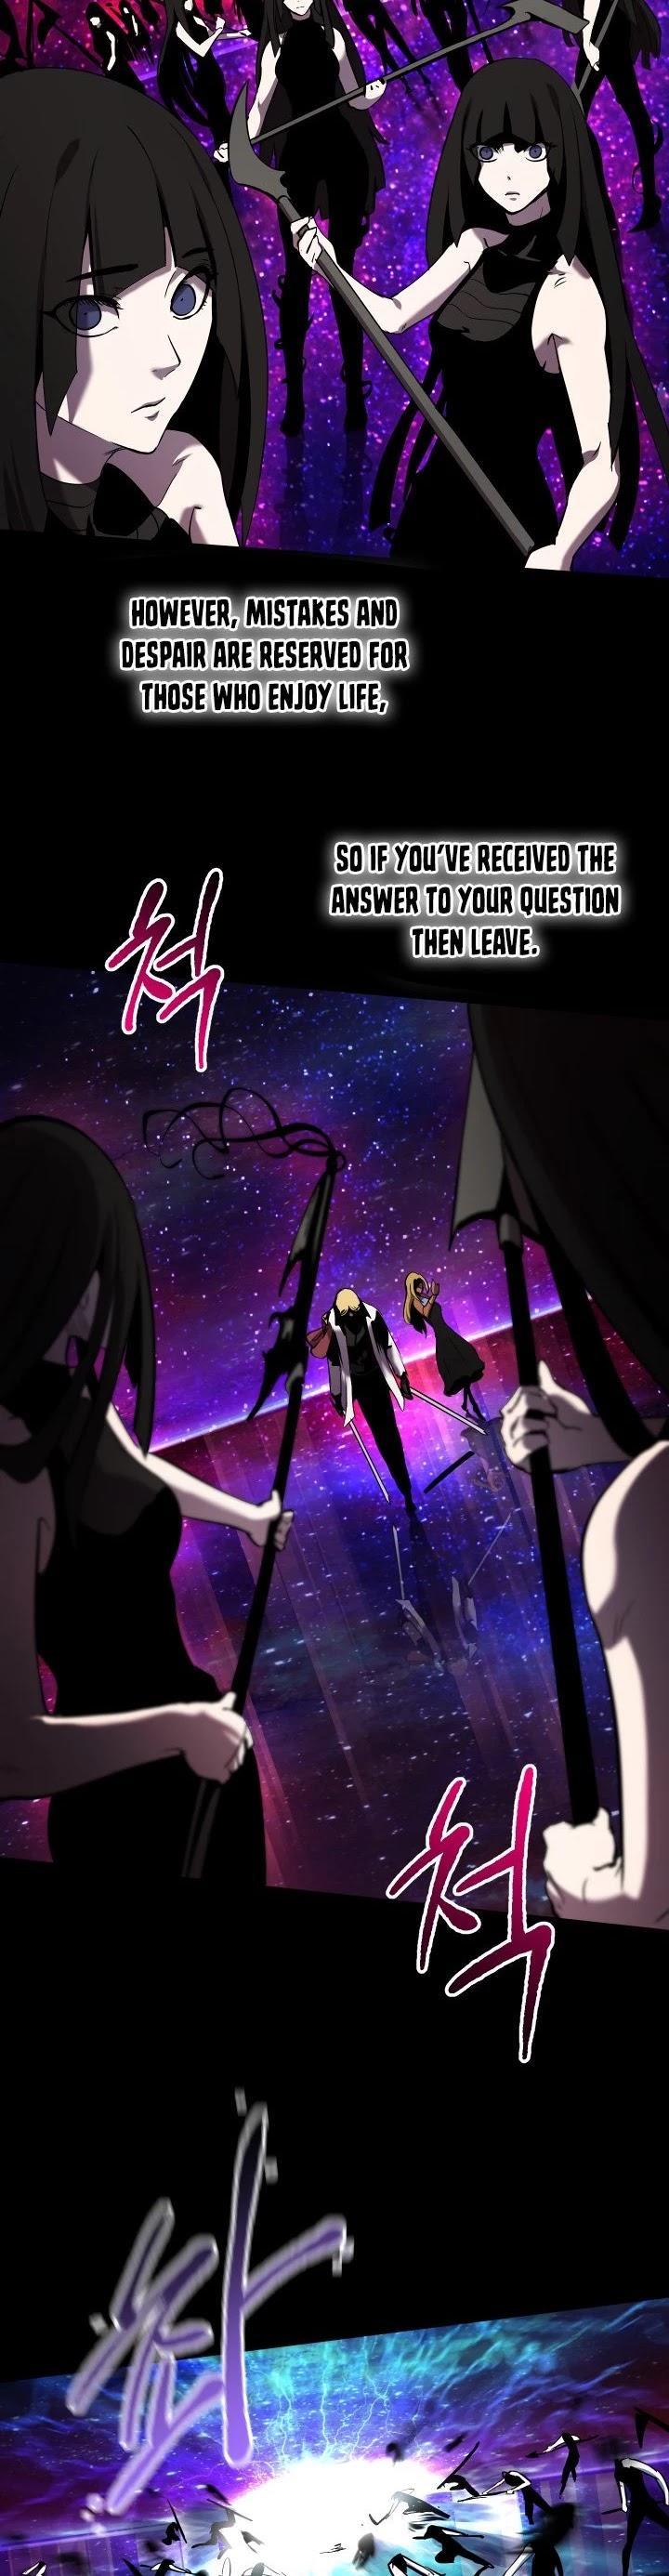 Survival Story Of A Sword King In A Fantasy World Chapter 50: End Season 1 page 9 - Mangakakalots.com